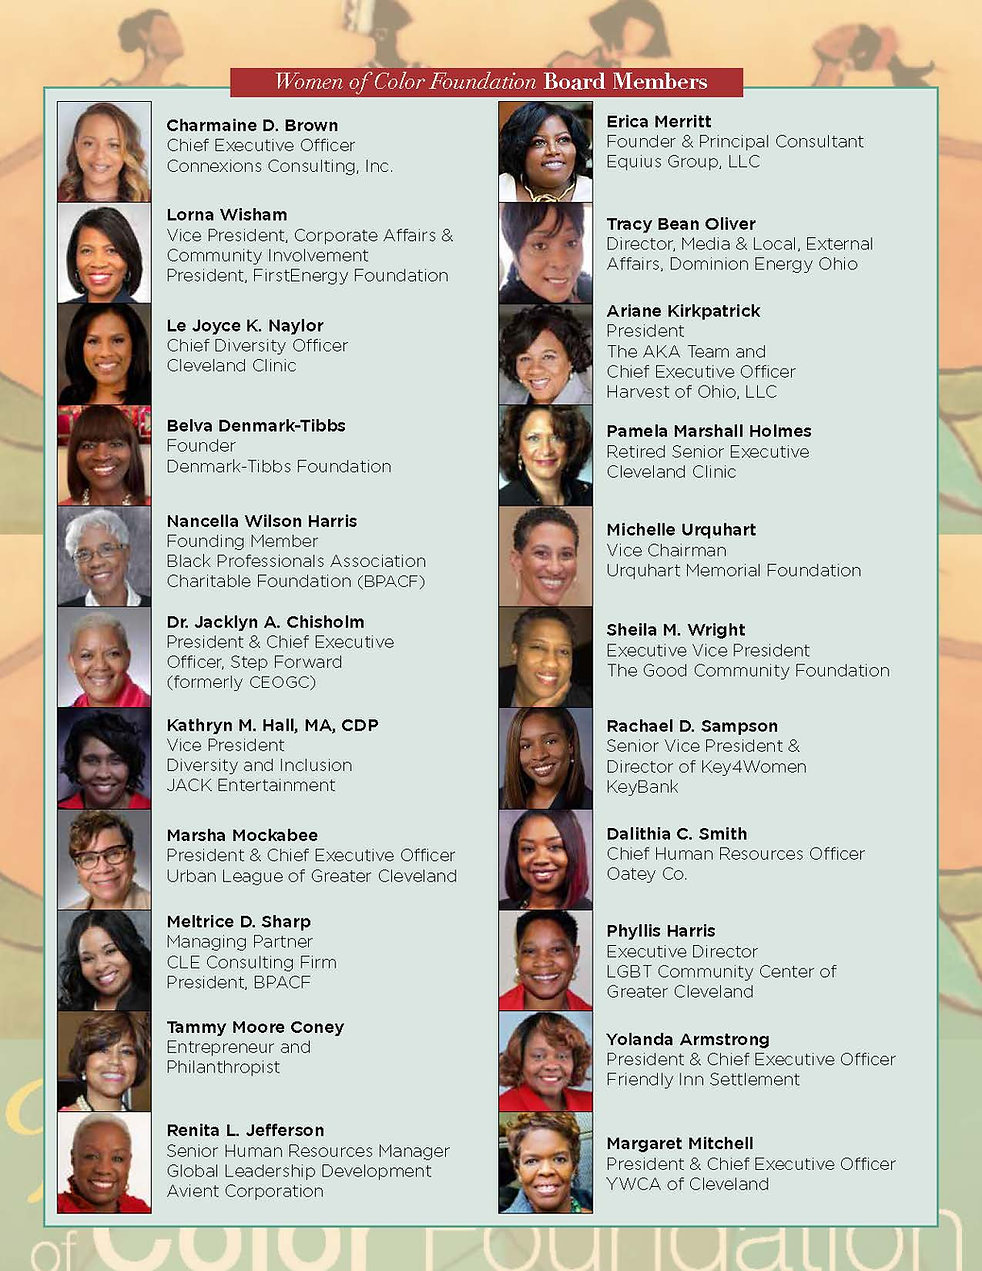 Women of Color Foundation 2021-2022 Boar